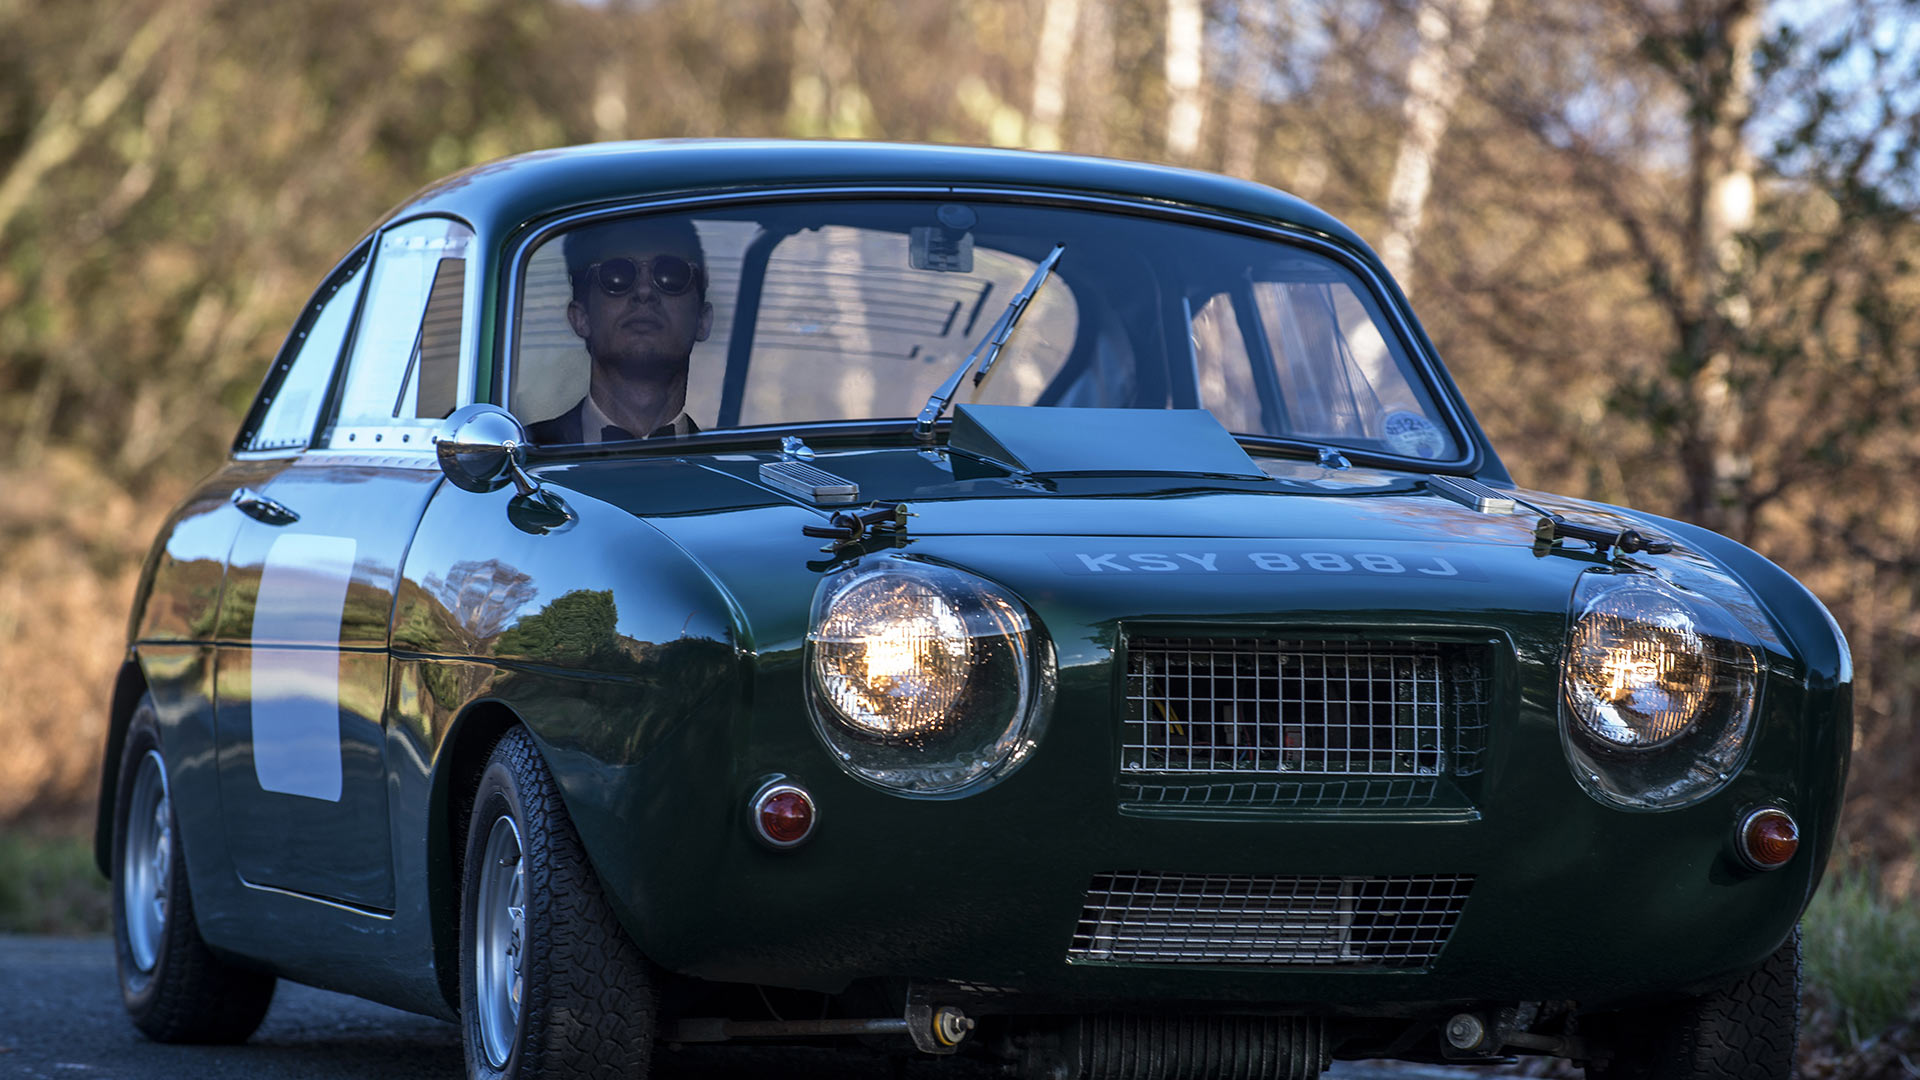 theOgle_Car_brendon_tyree-(1)